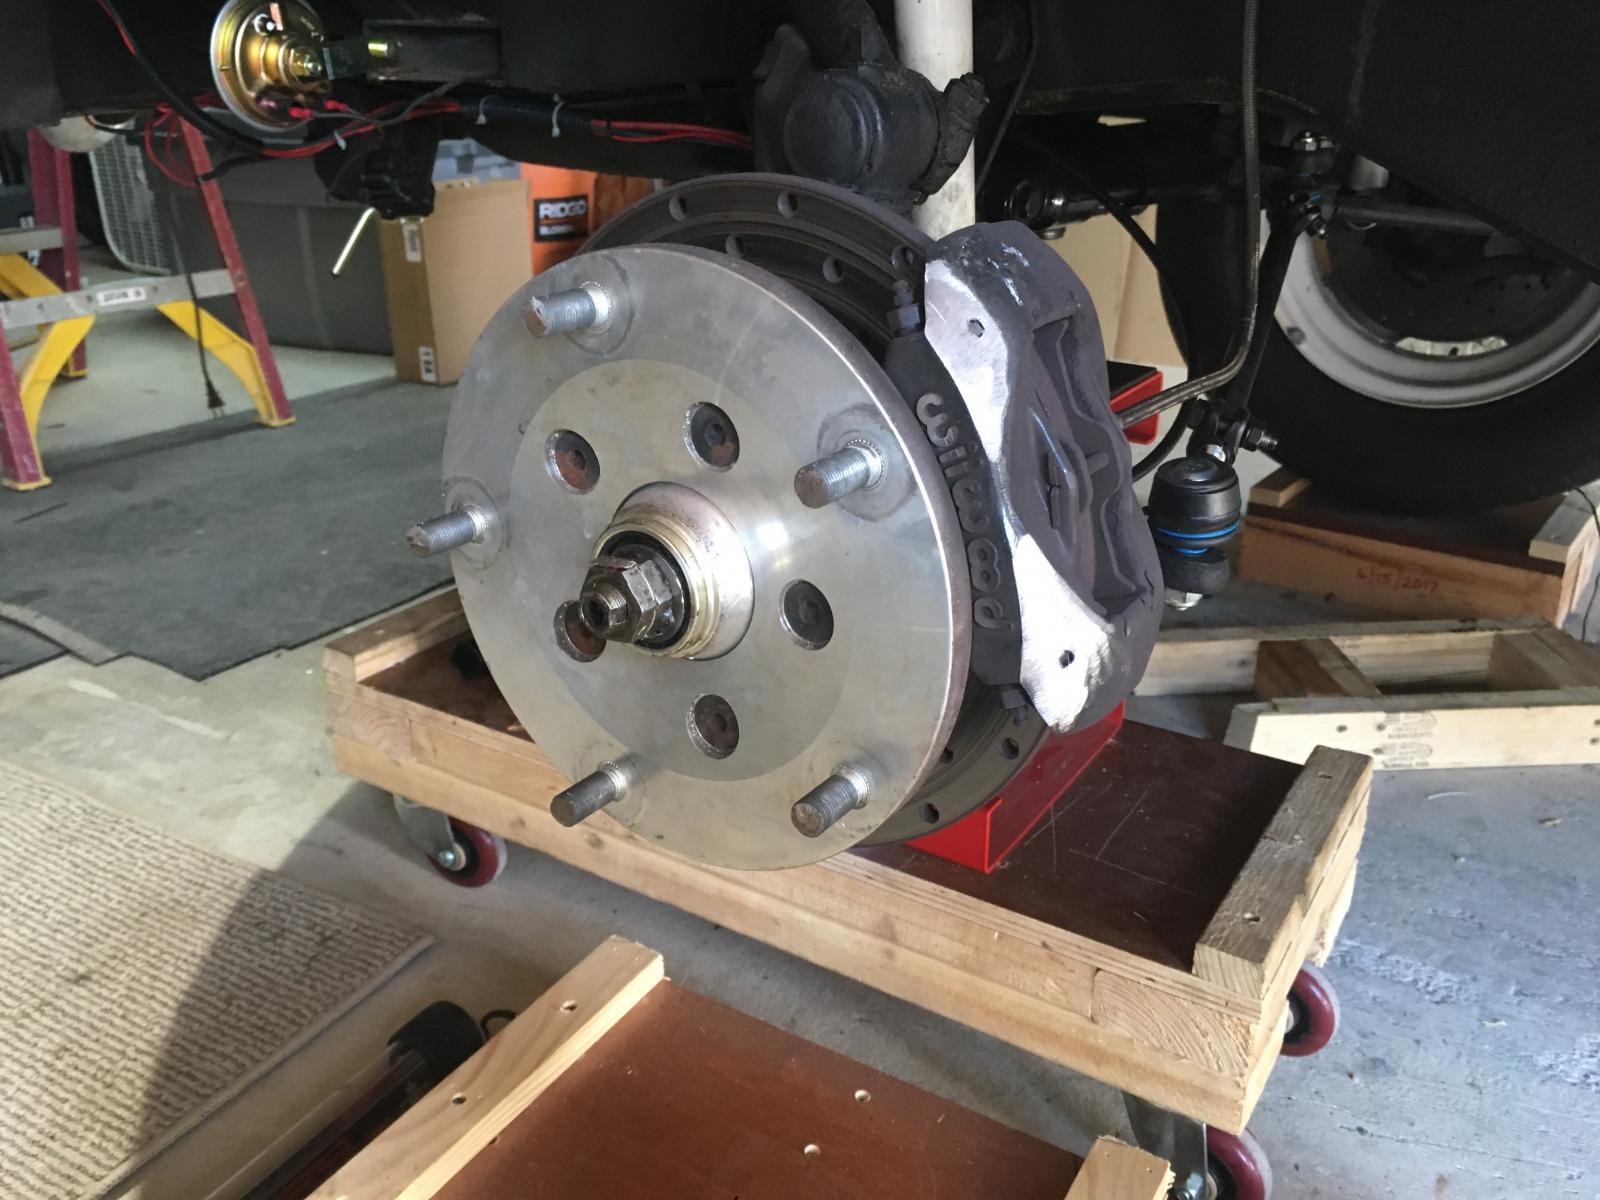 "Clearance brake caliper to fix stock 15"" wheel"